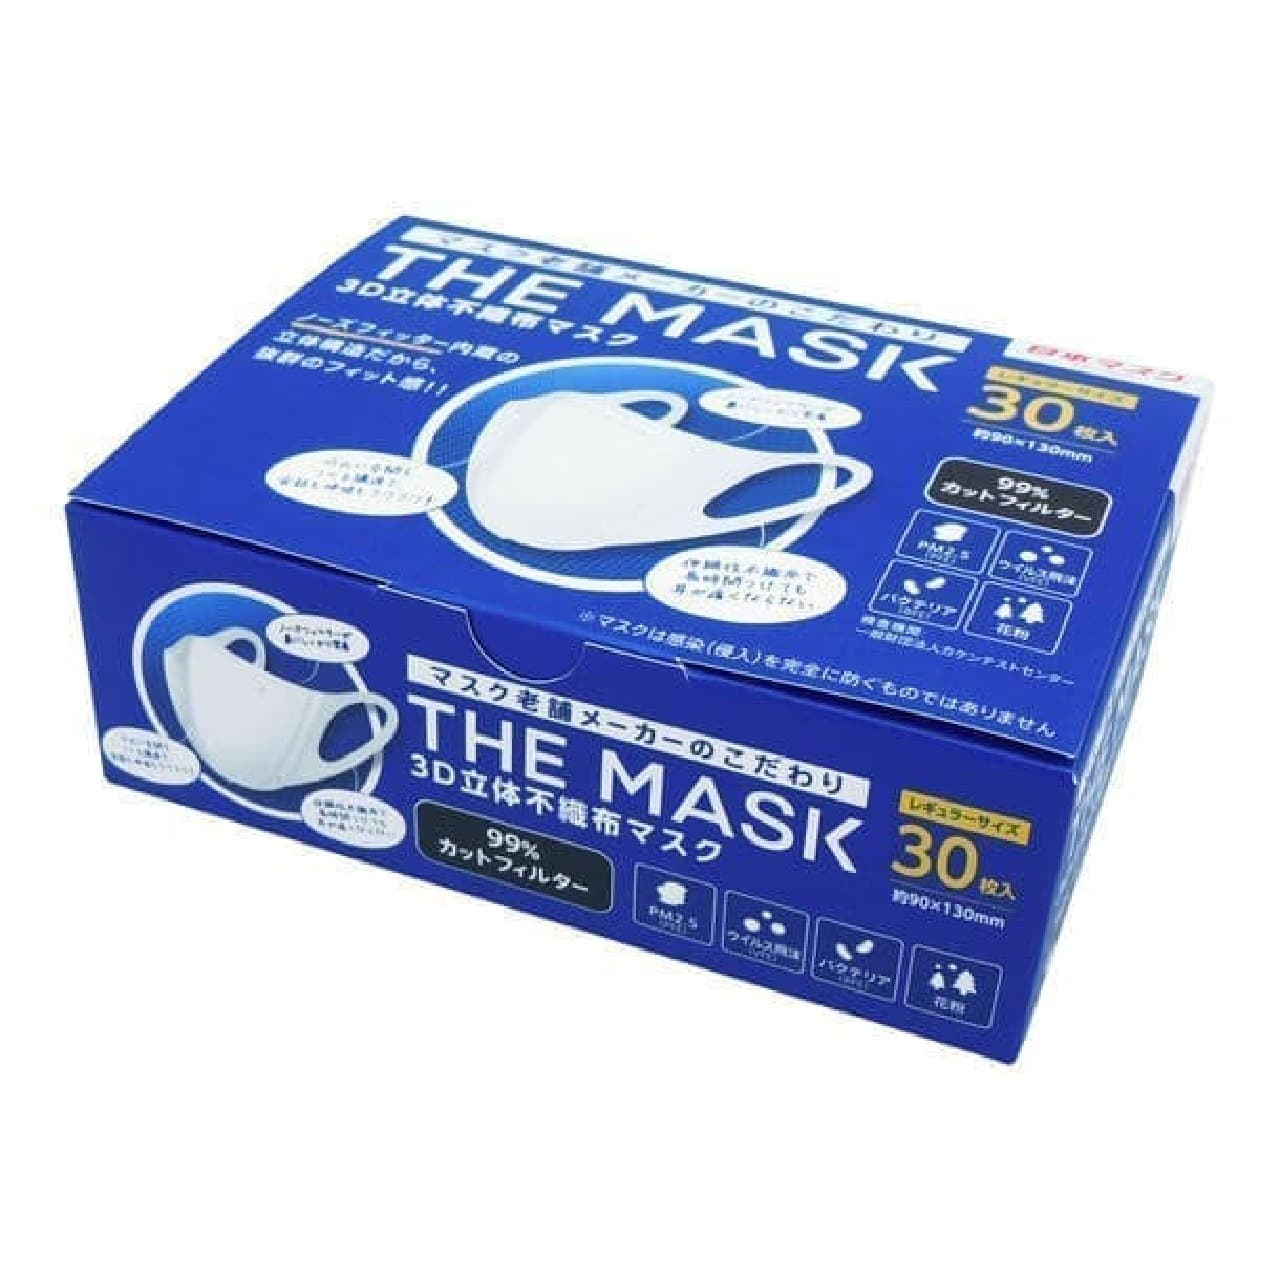 「THE MASK 3D立体不織布マスク30P」発売 -- フィット感追求&快適さ長くキープ